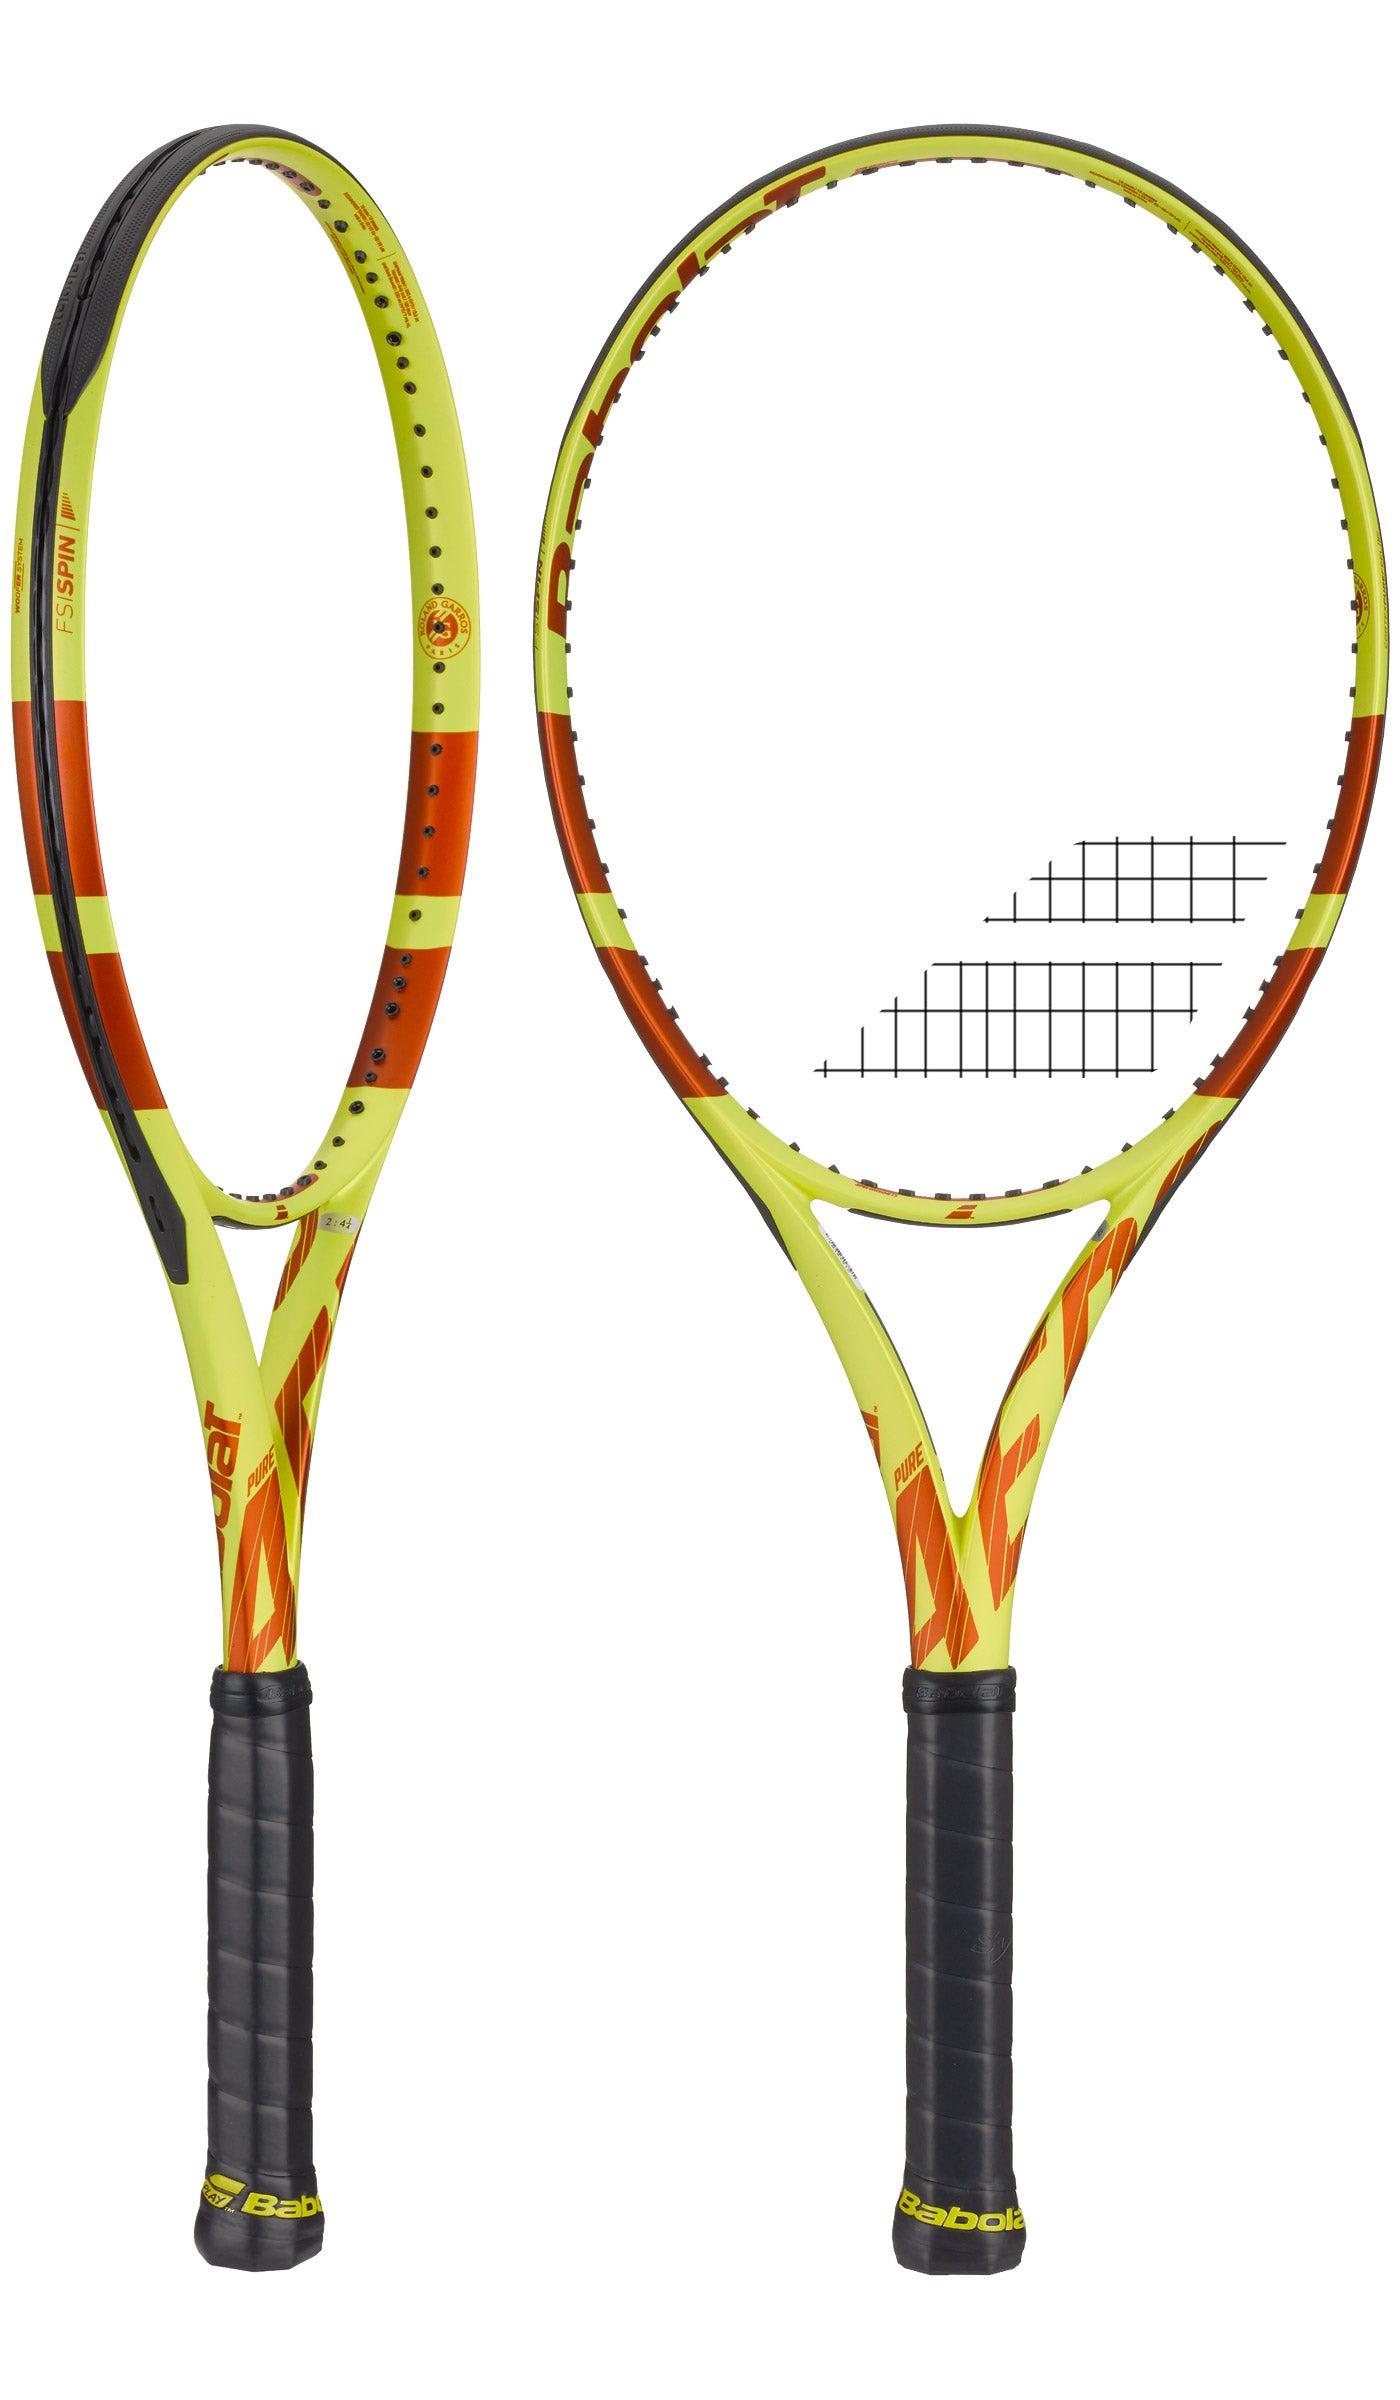 Luxilon 4G 125 Soft 200 m Tennissaiten Tennis Strings 1,05€//m